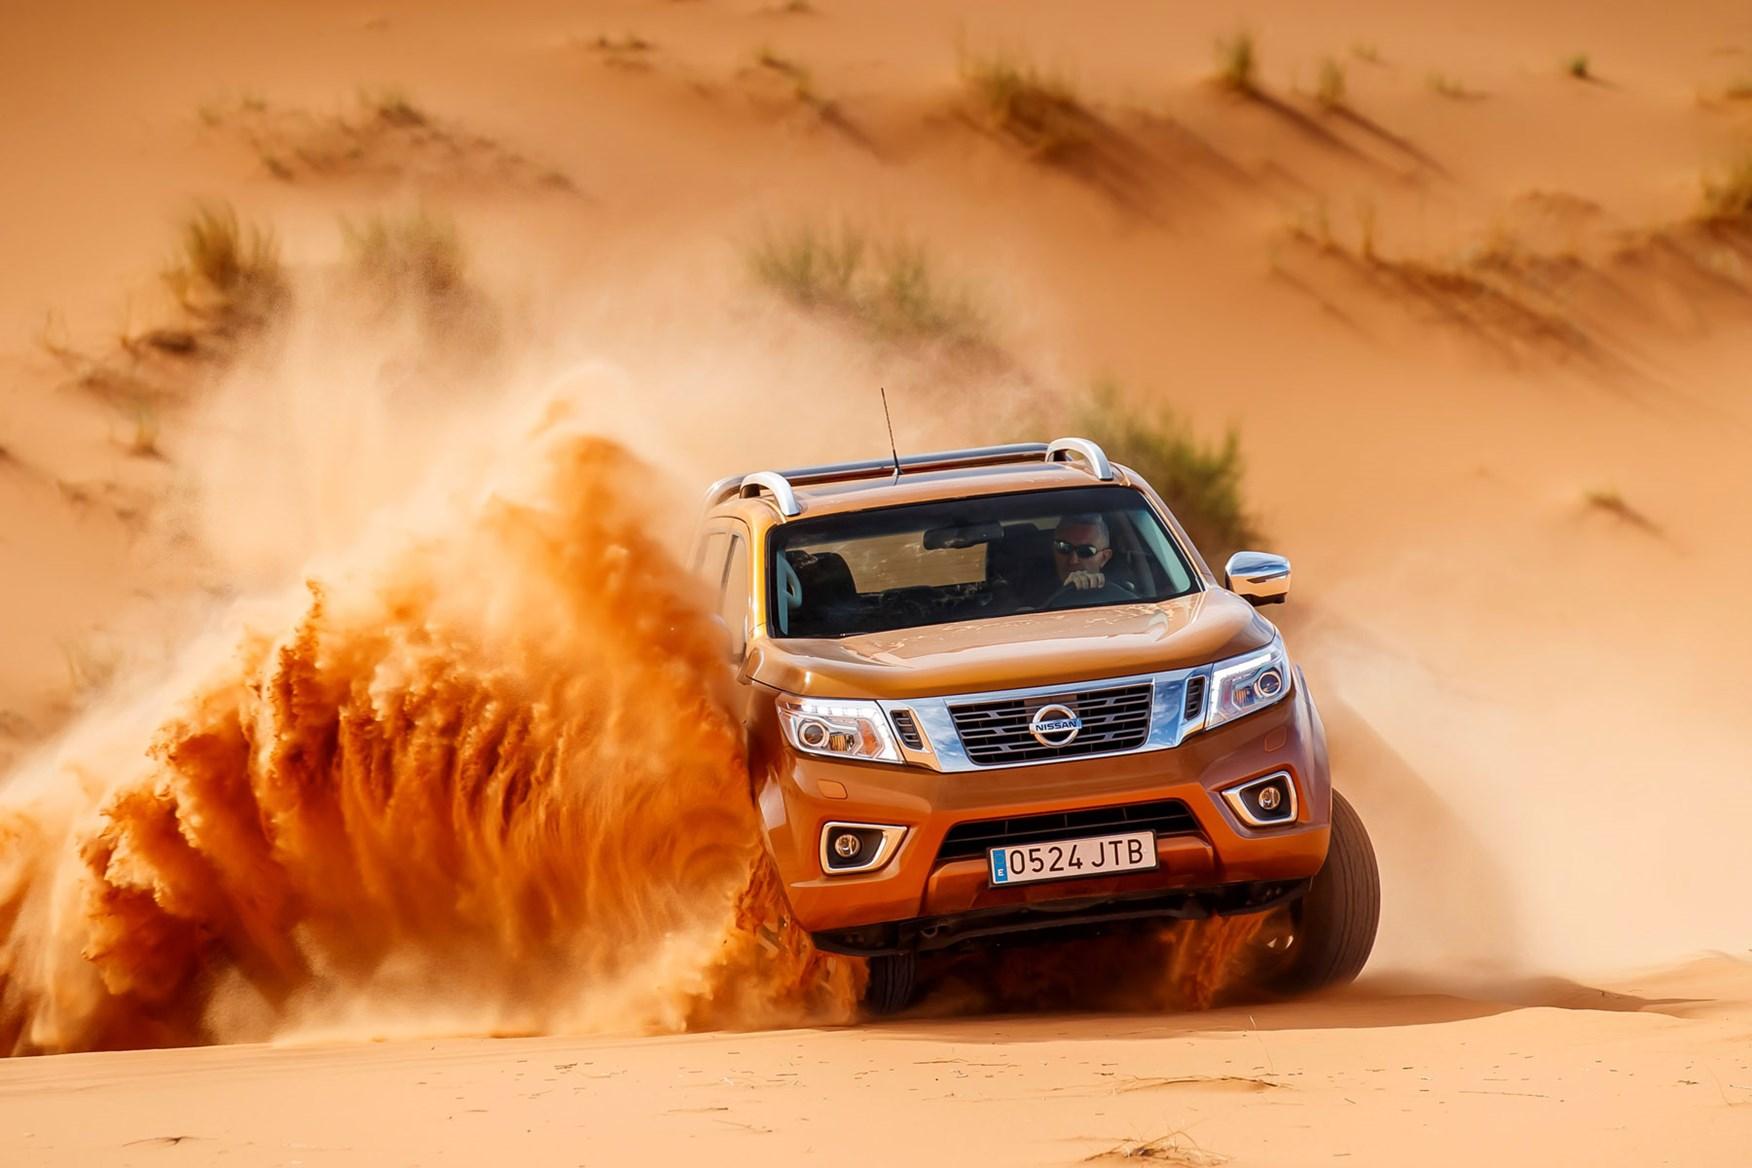 Nissan Navara Tekna review - driving in the Sahara Desert, front view, orange, spraying sand